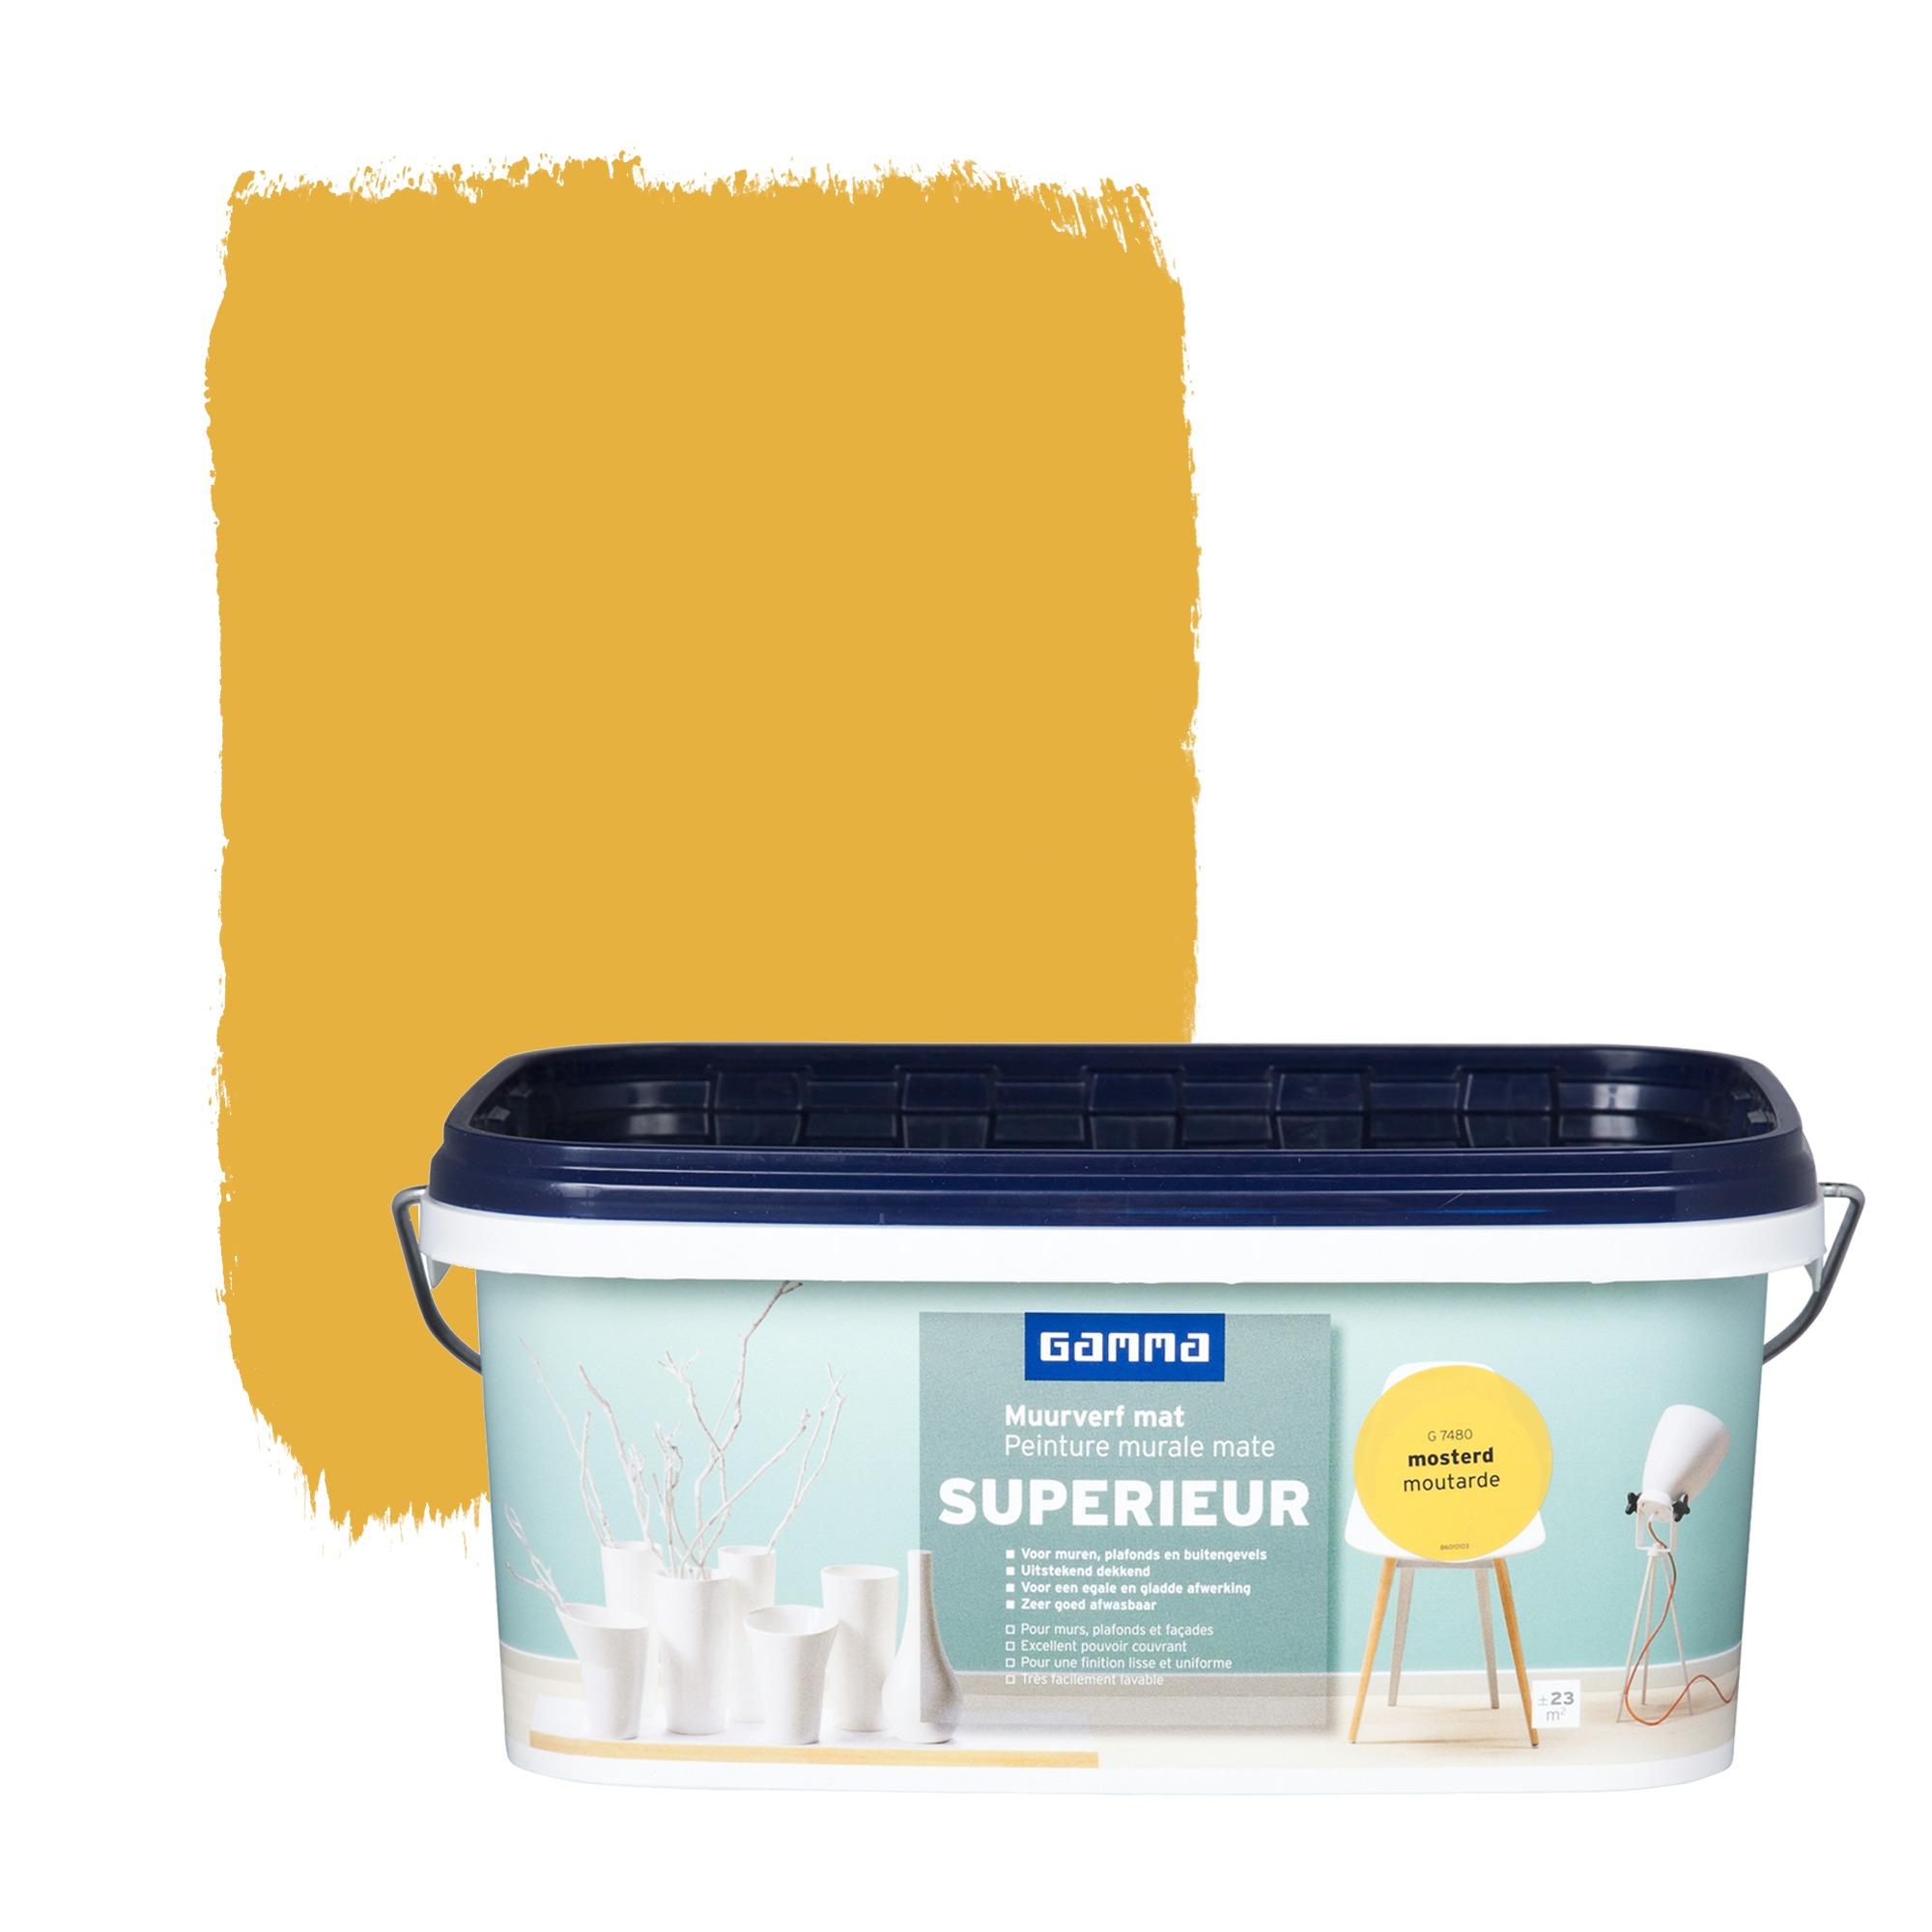 peinture murale gamma superieur mat moutarde 2 5 l. Black Bedroom Furniture Sets. Home Design Ideas